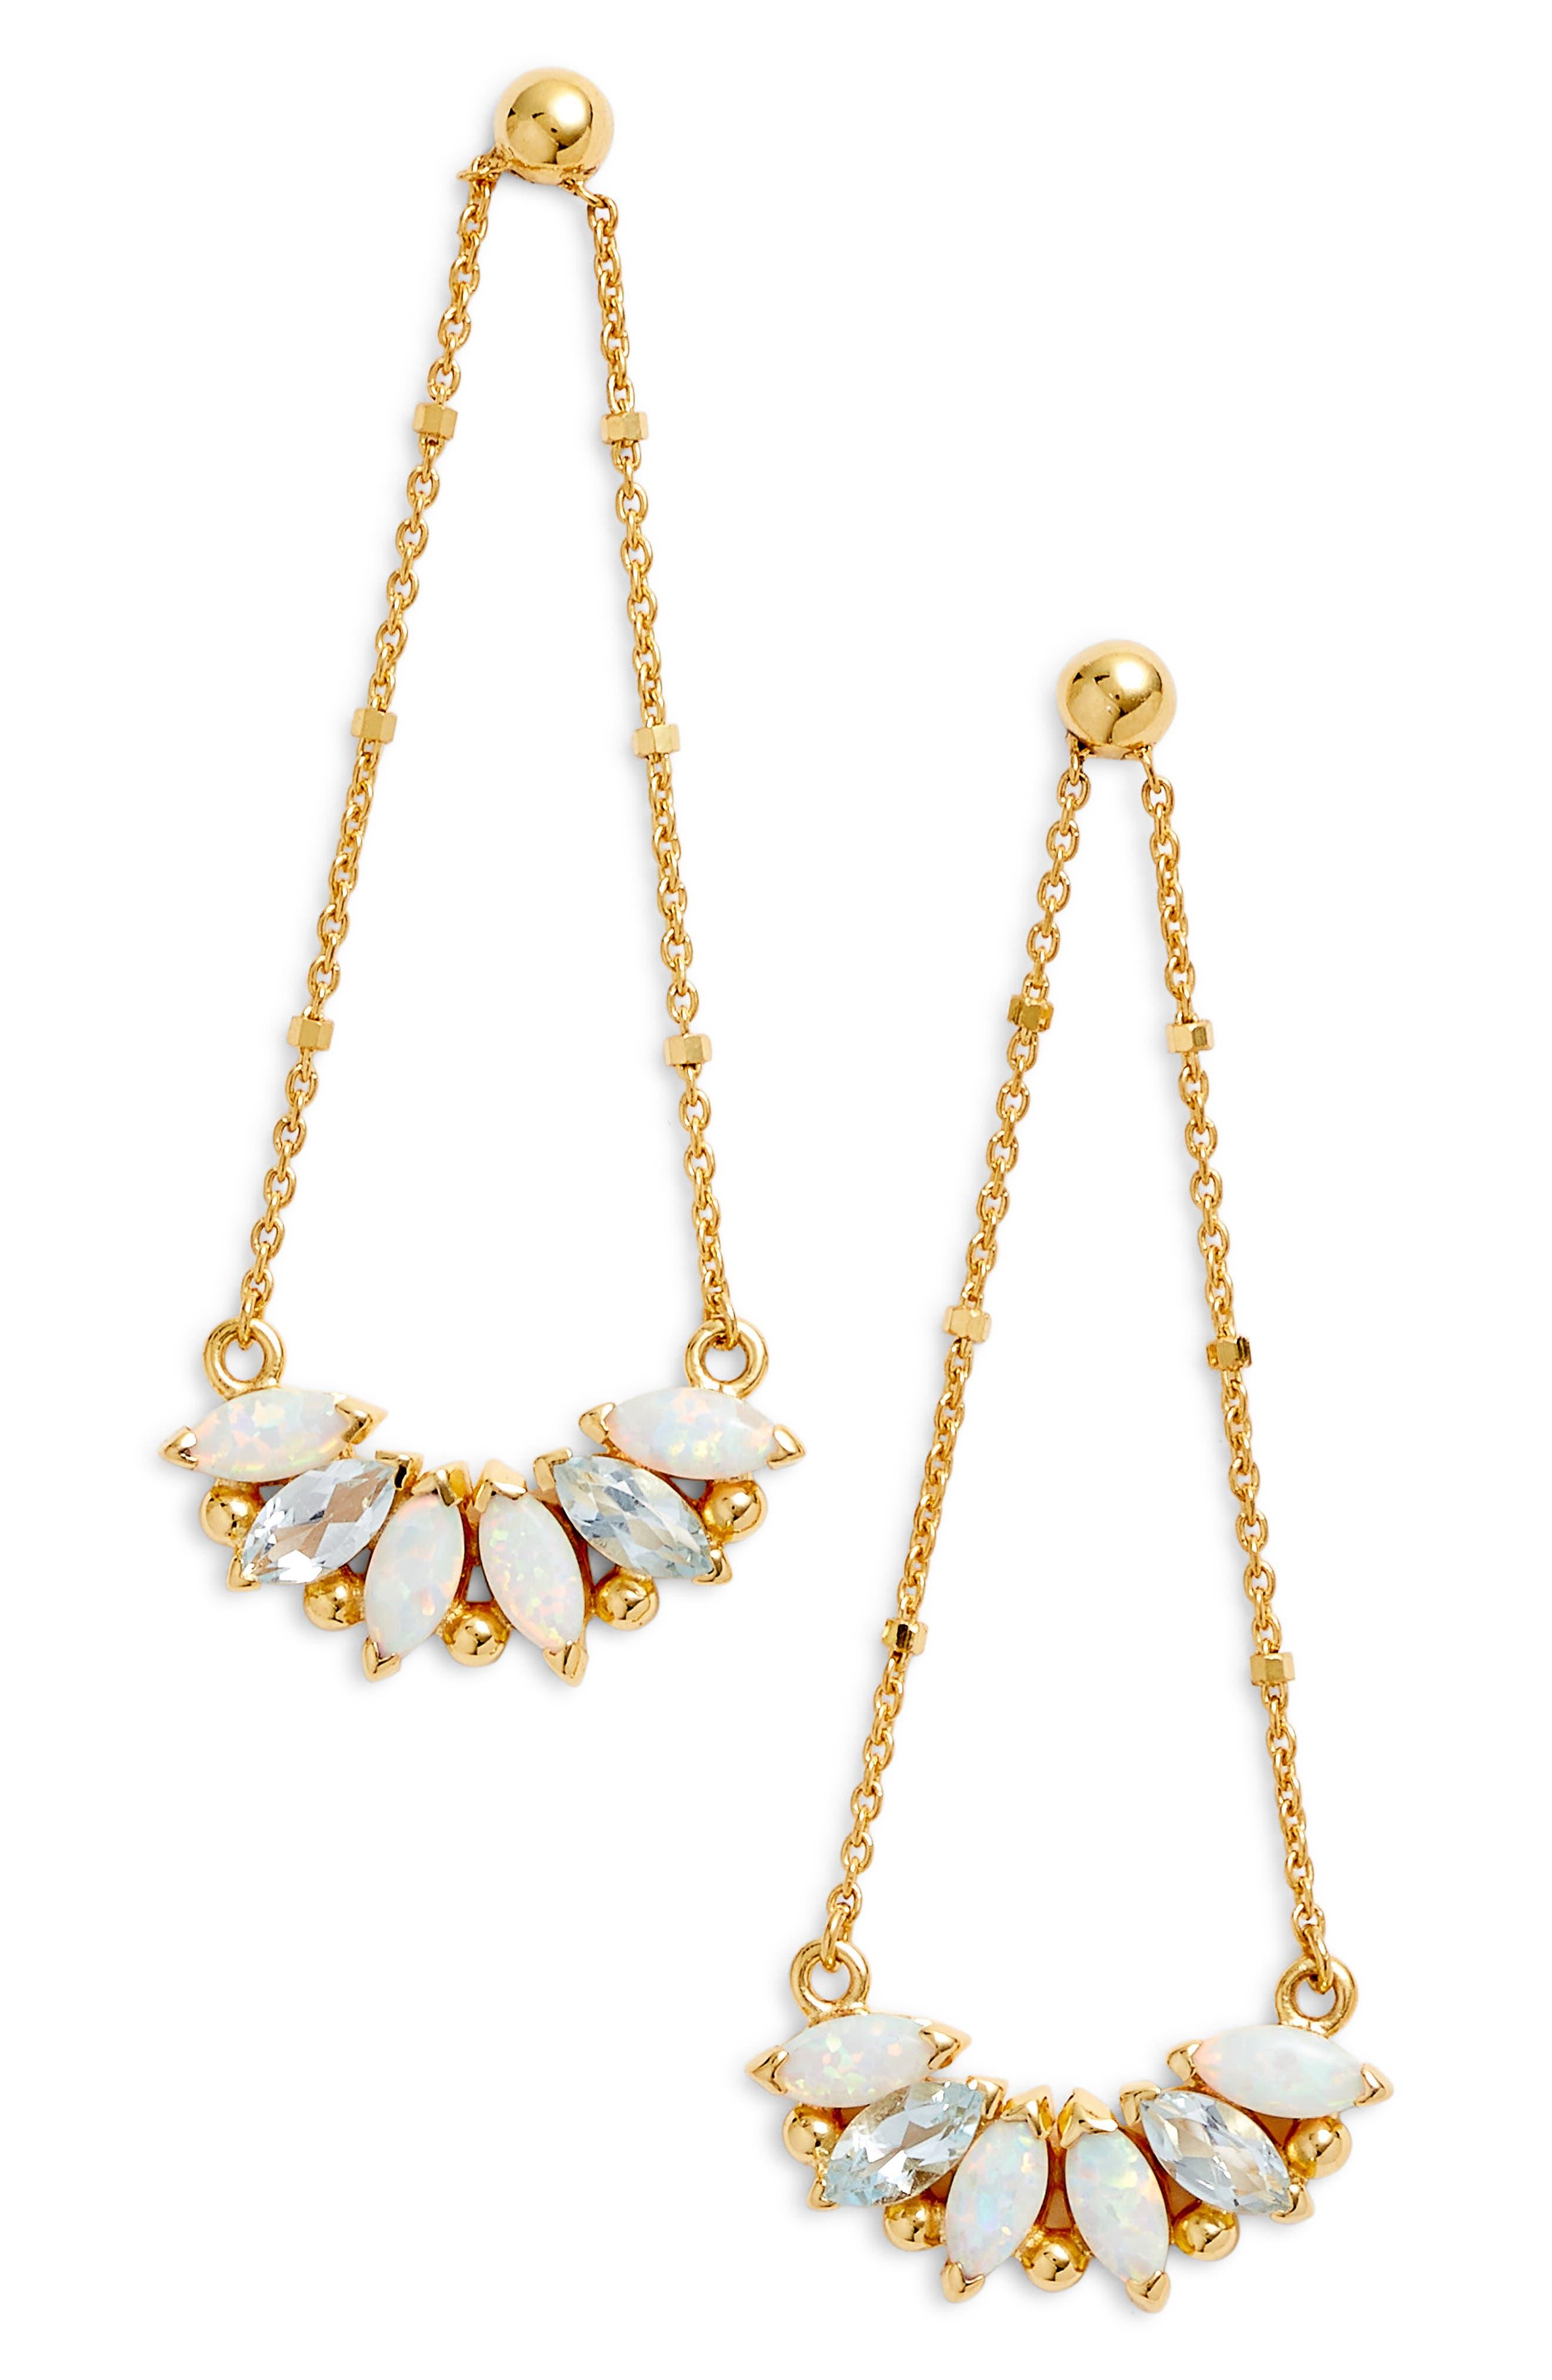 Sydney Multi-Stone Chandelier Earrings,                             Main thumbnail 1, color,                             Gold